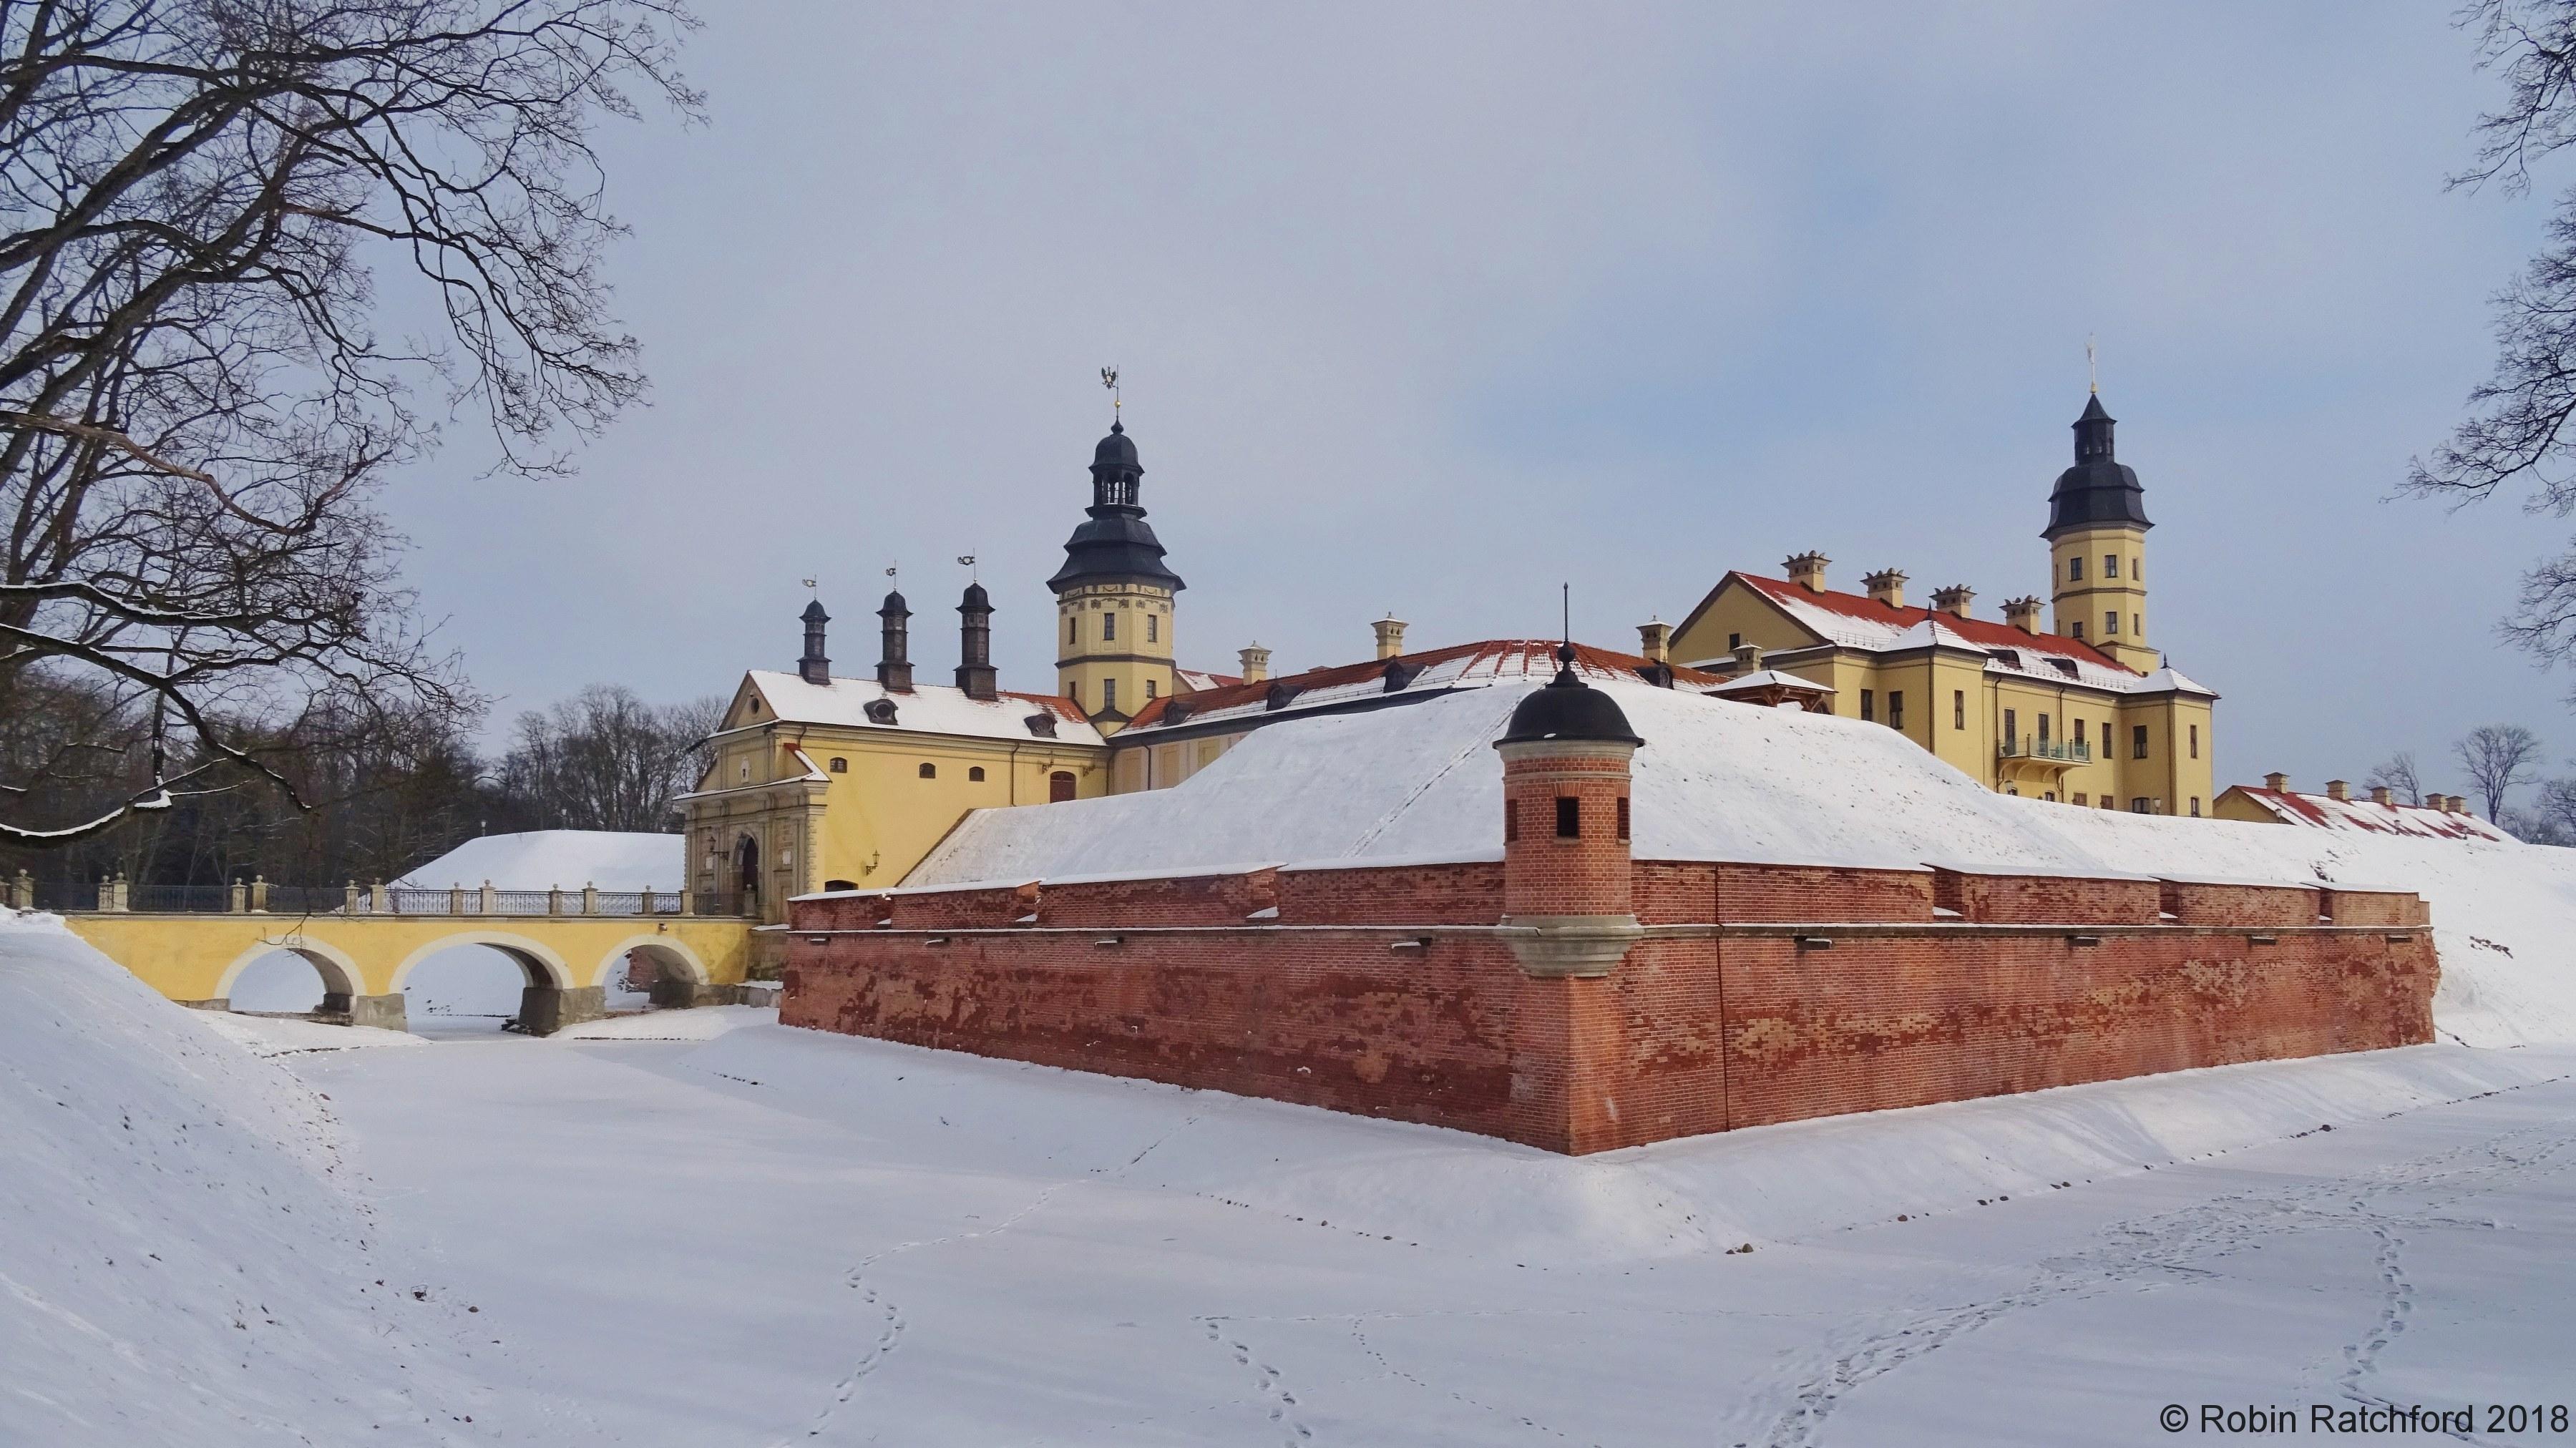 Nesvizh - the moat